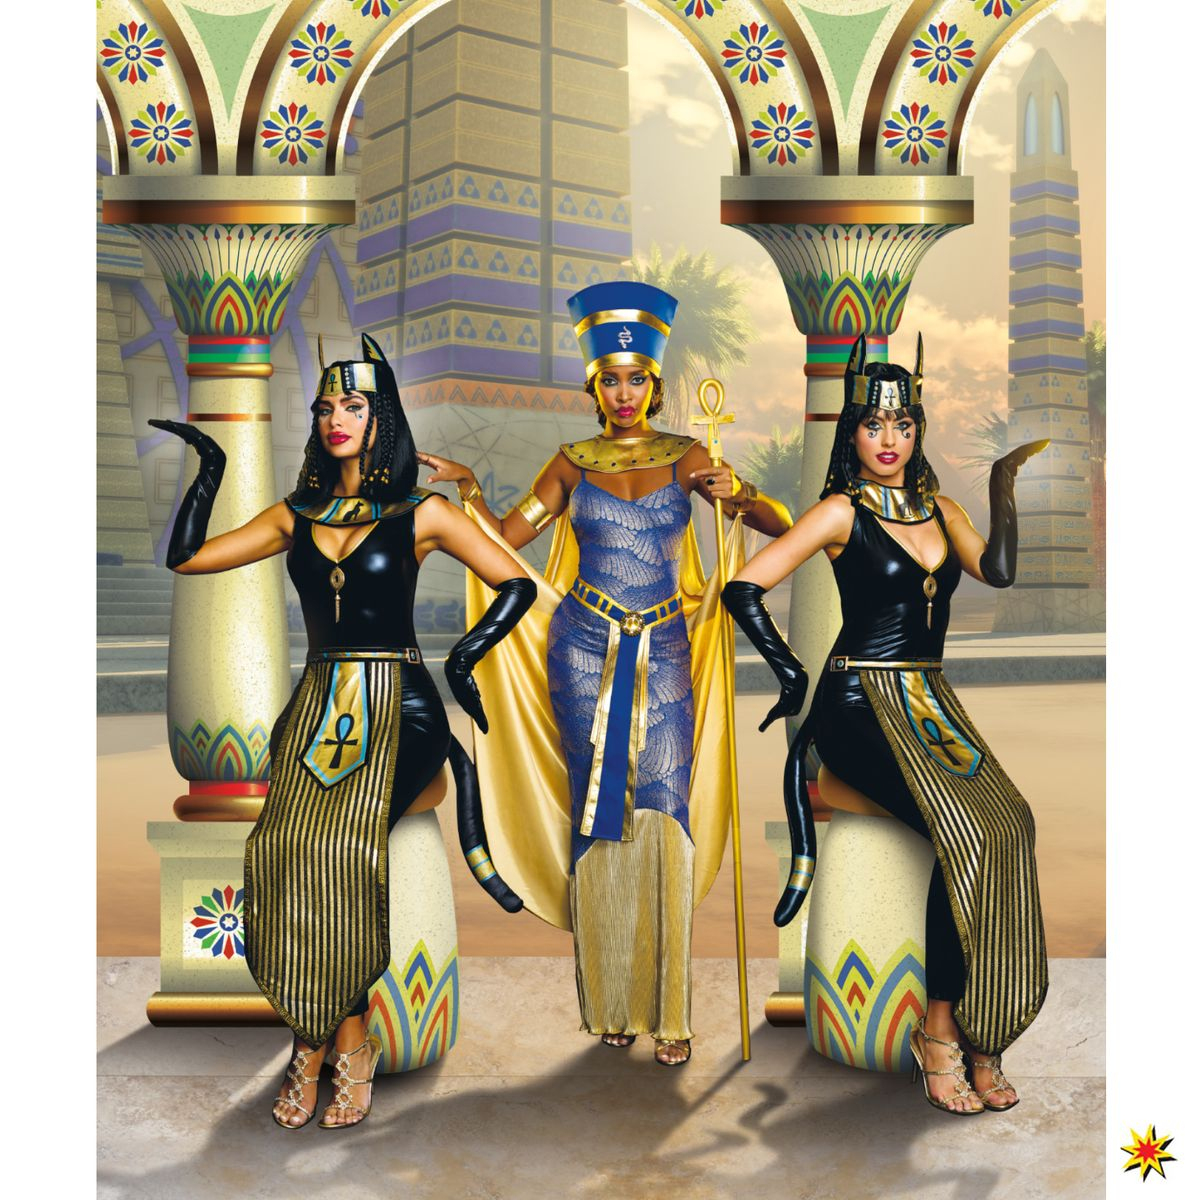 Ägyptische Katzengöttin Bastet ganzes Ägyptische Katzengöttin